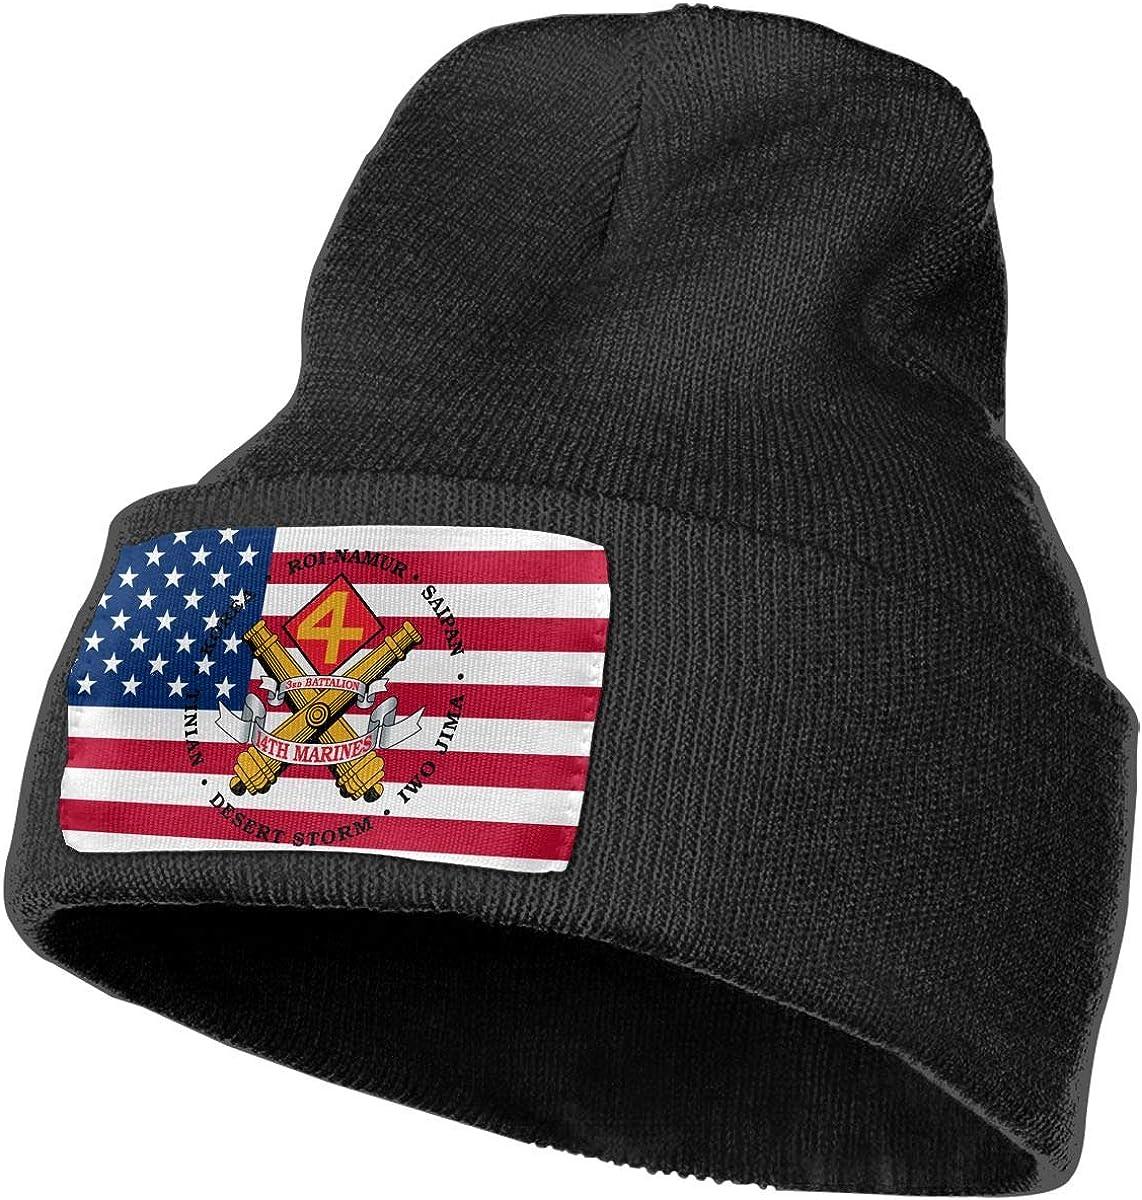 3rd Battalion 14th Marines Men/&Women Warm Winter Knit Plain Beanie Hat Skull Cap Acrylic Knit Cuff Hat